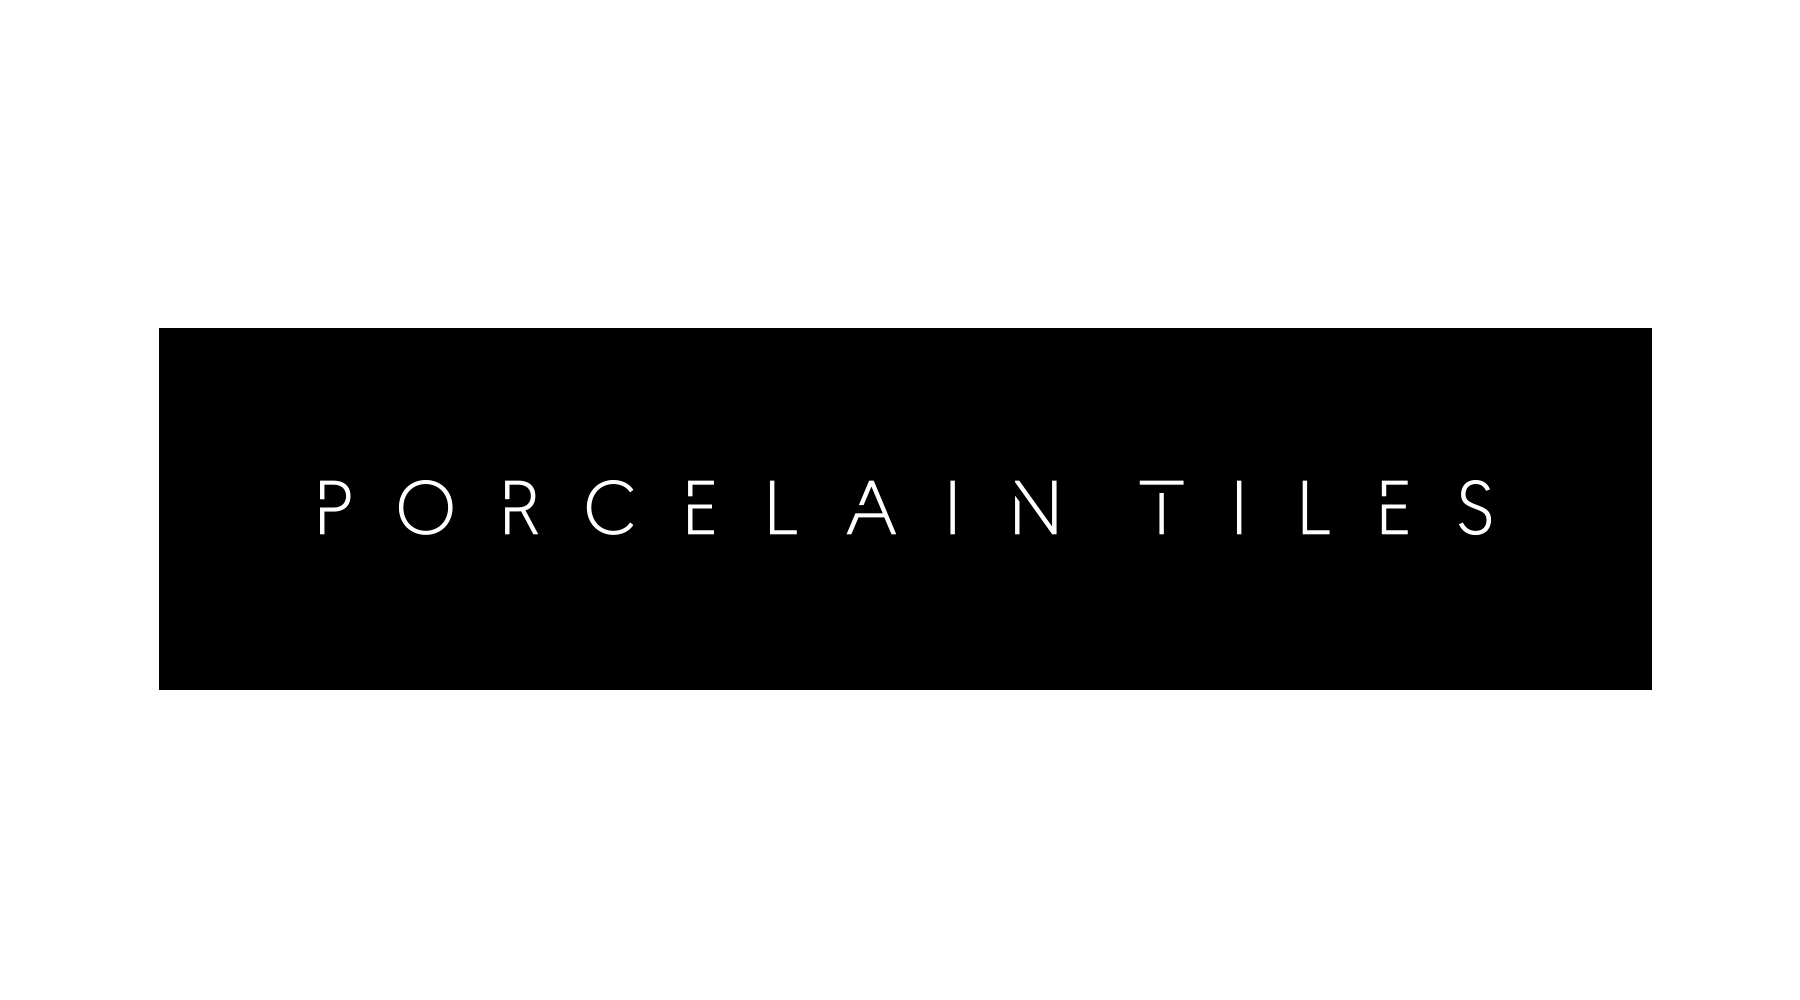 porcelain-tiles-logo